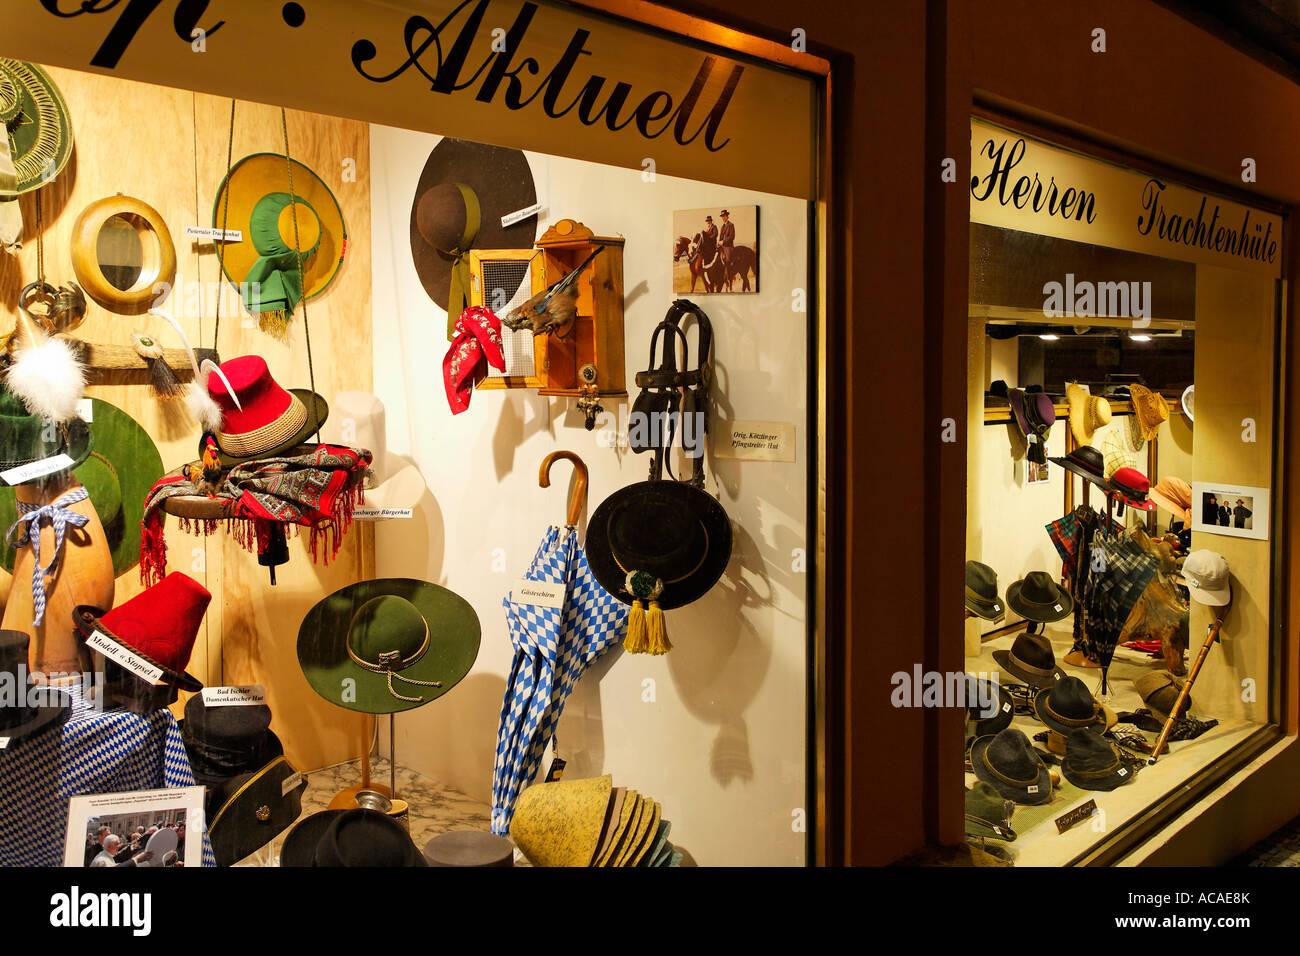 Hat store Hut Koenig, Regensburg, Upper Palatinate, Bavaria, Germany - Stock Image